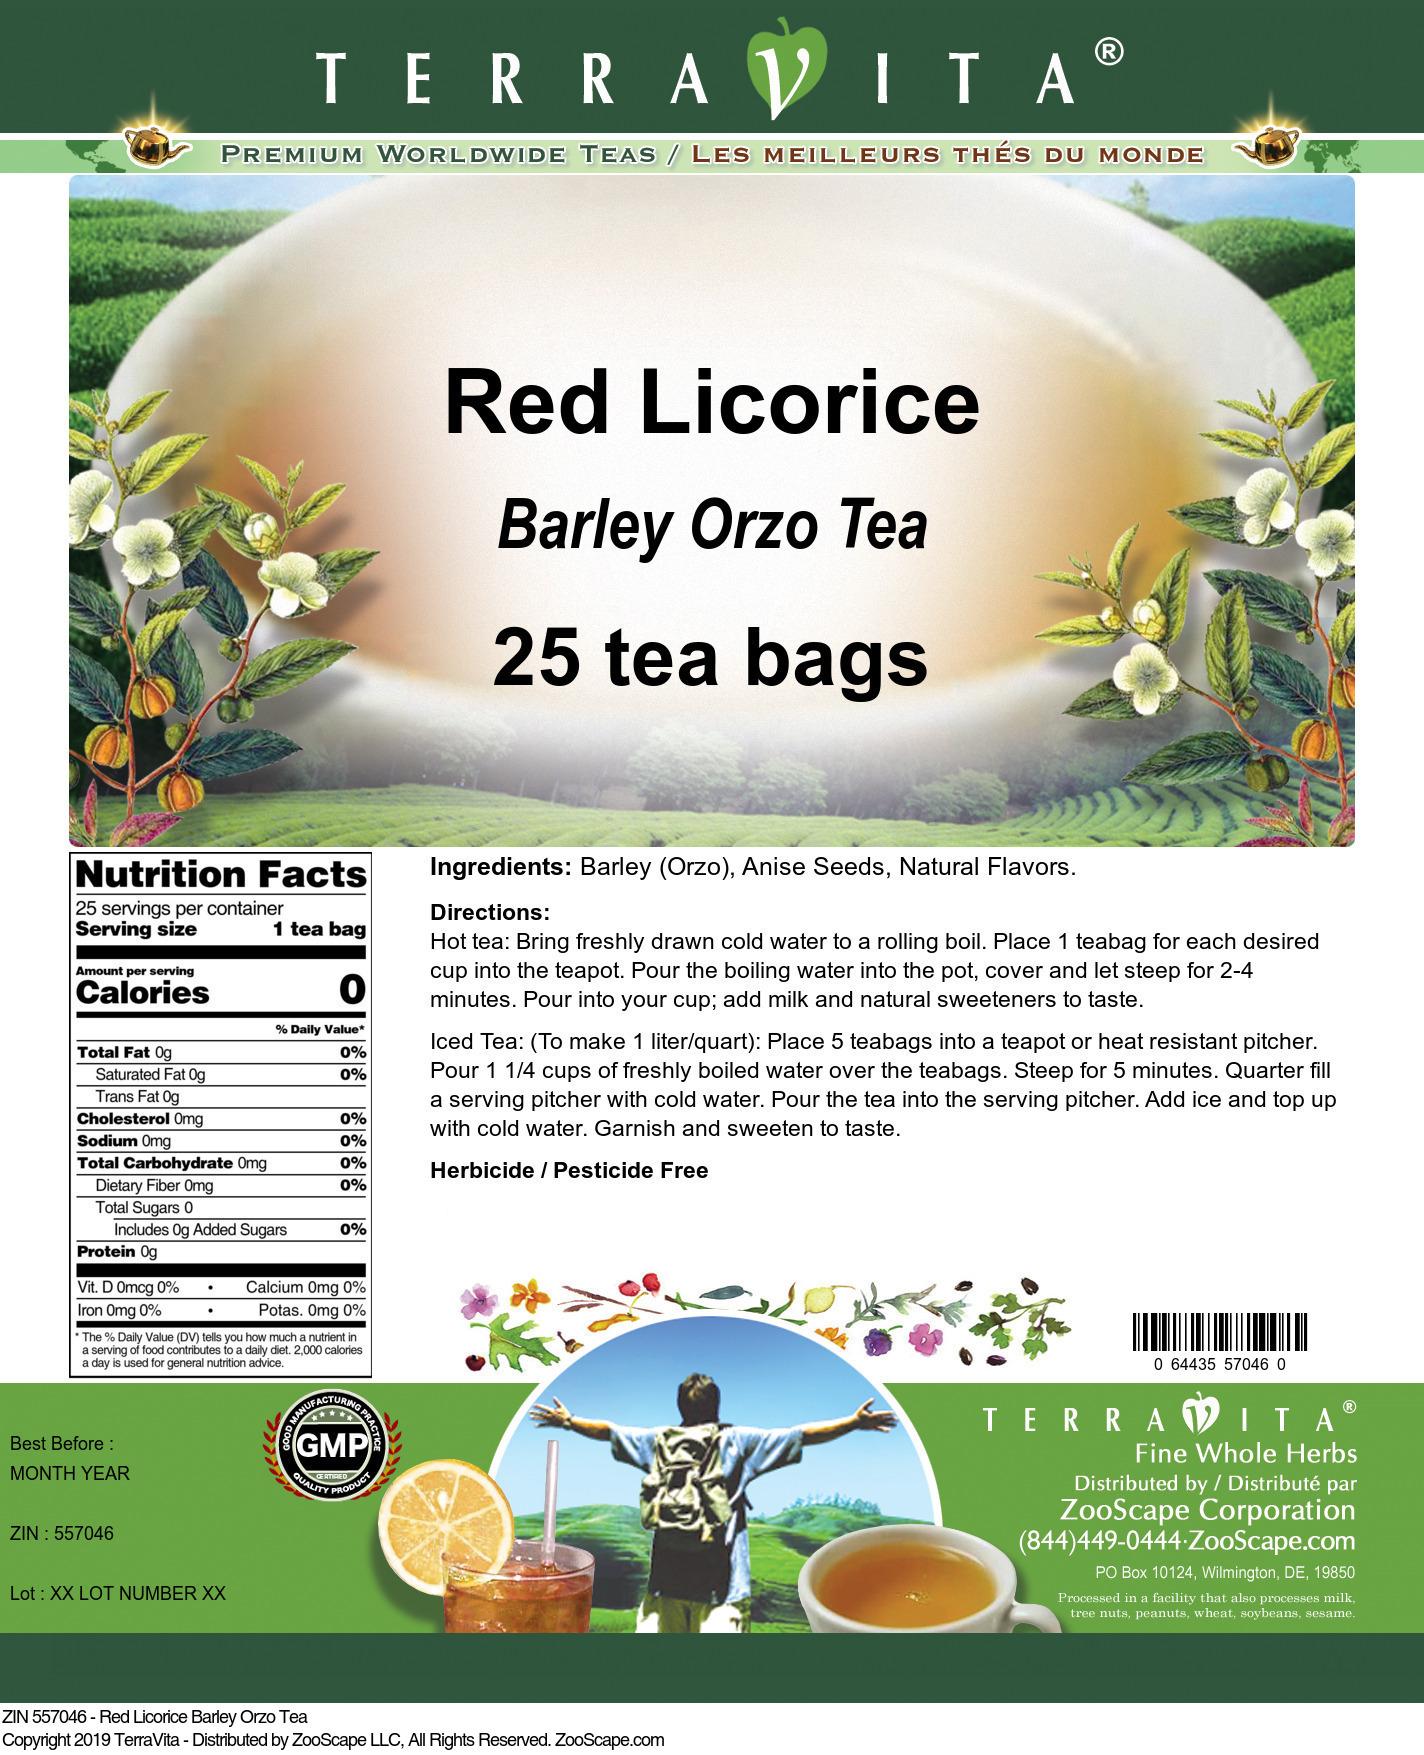 Red Licorice Barley Orzo Tea